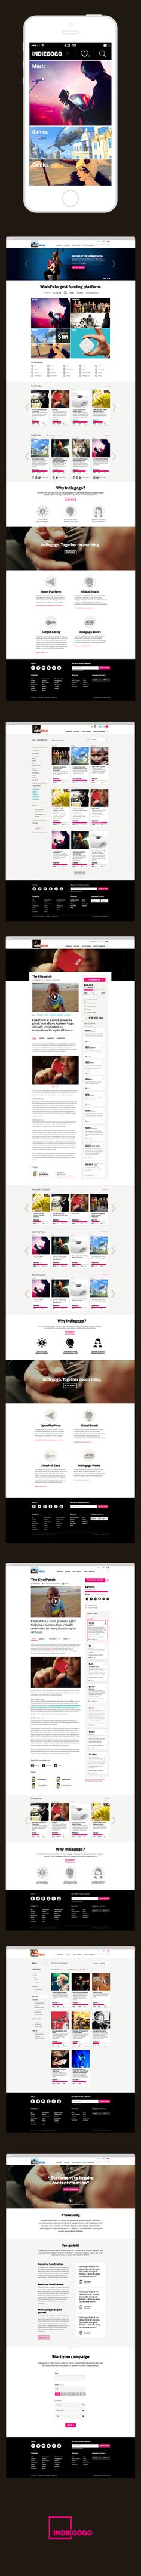 Indiegogo by Moosesyrup, via Behance